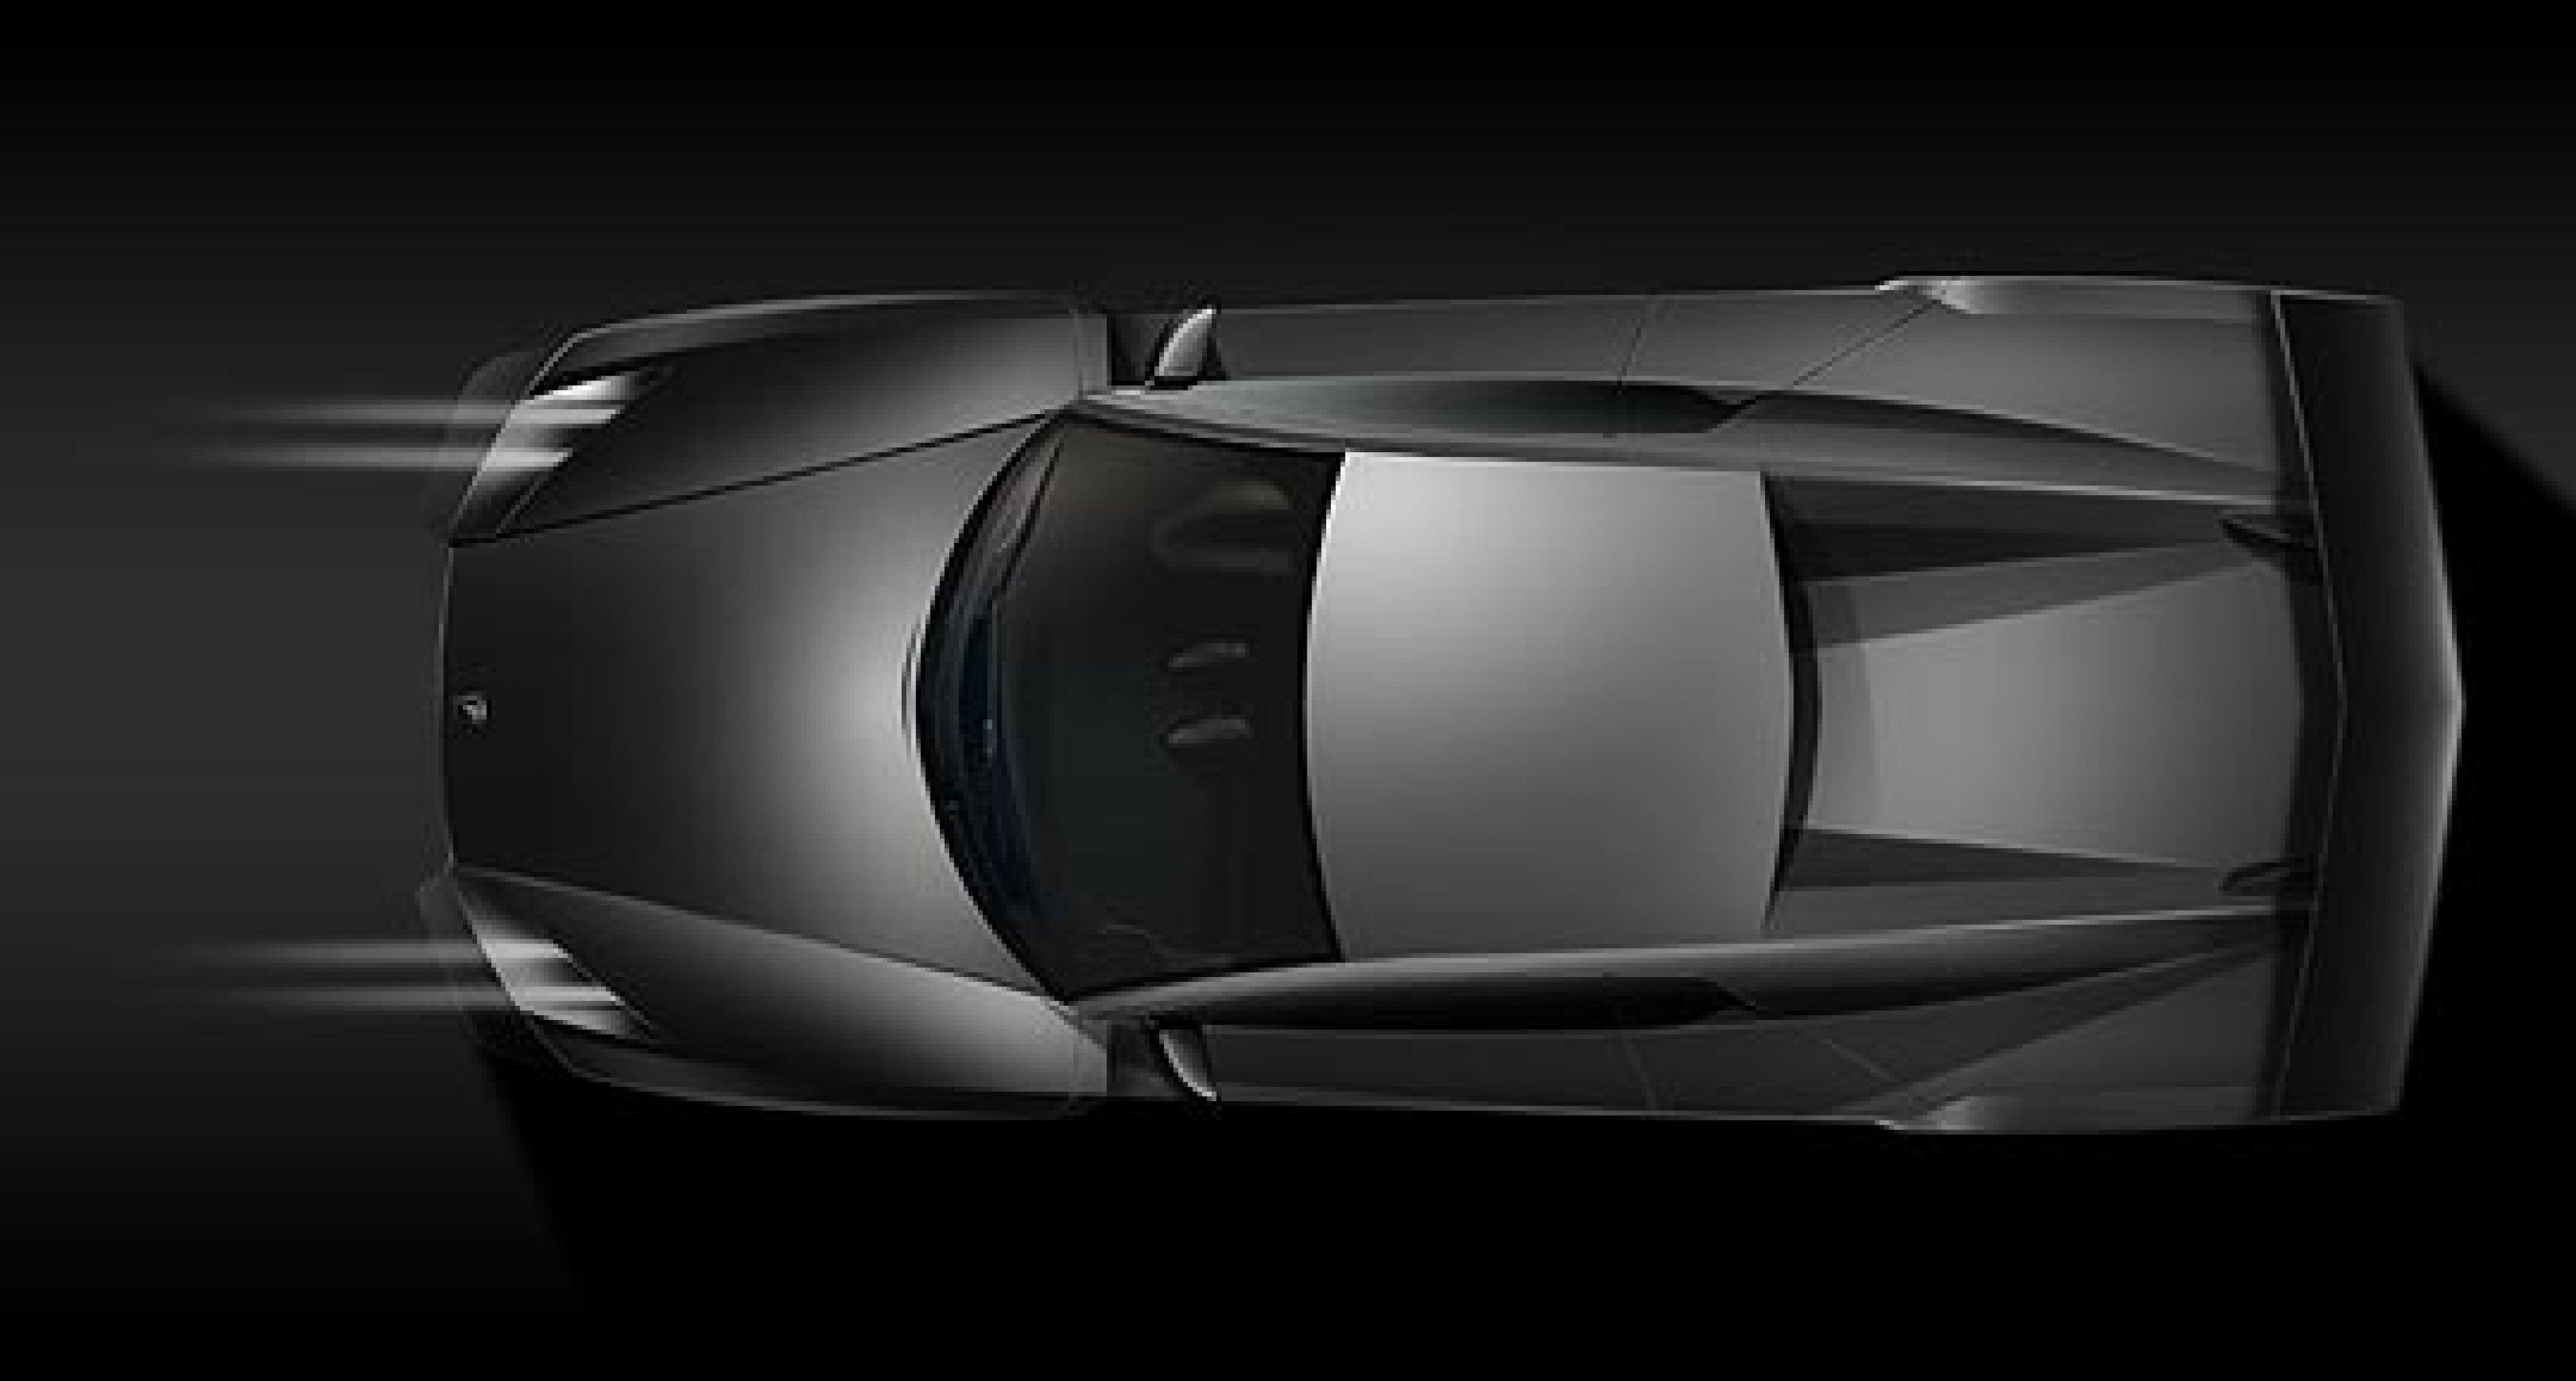 Fenix Automotive: Teaser Pics of New Supercar